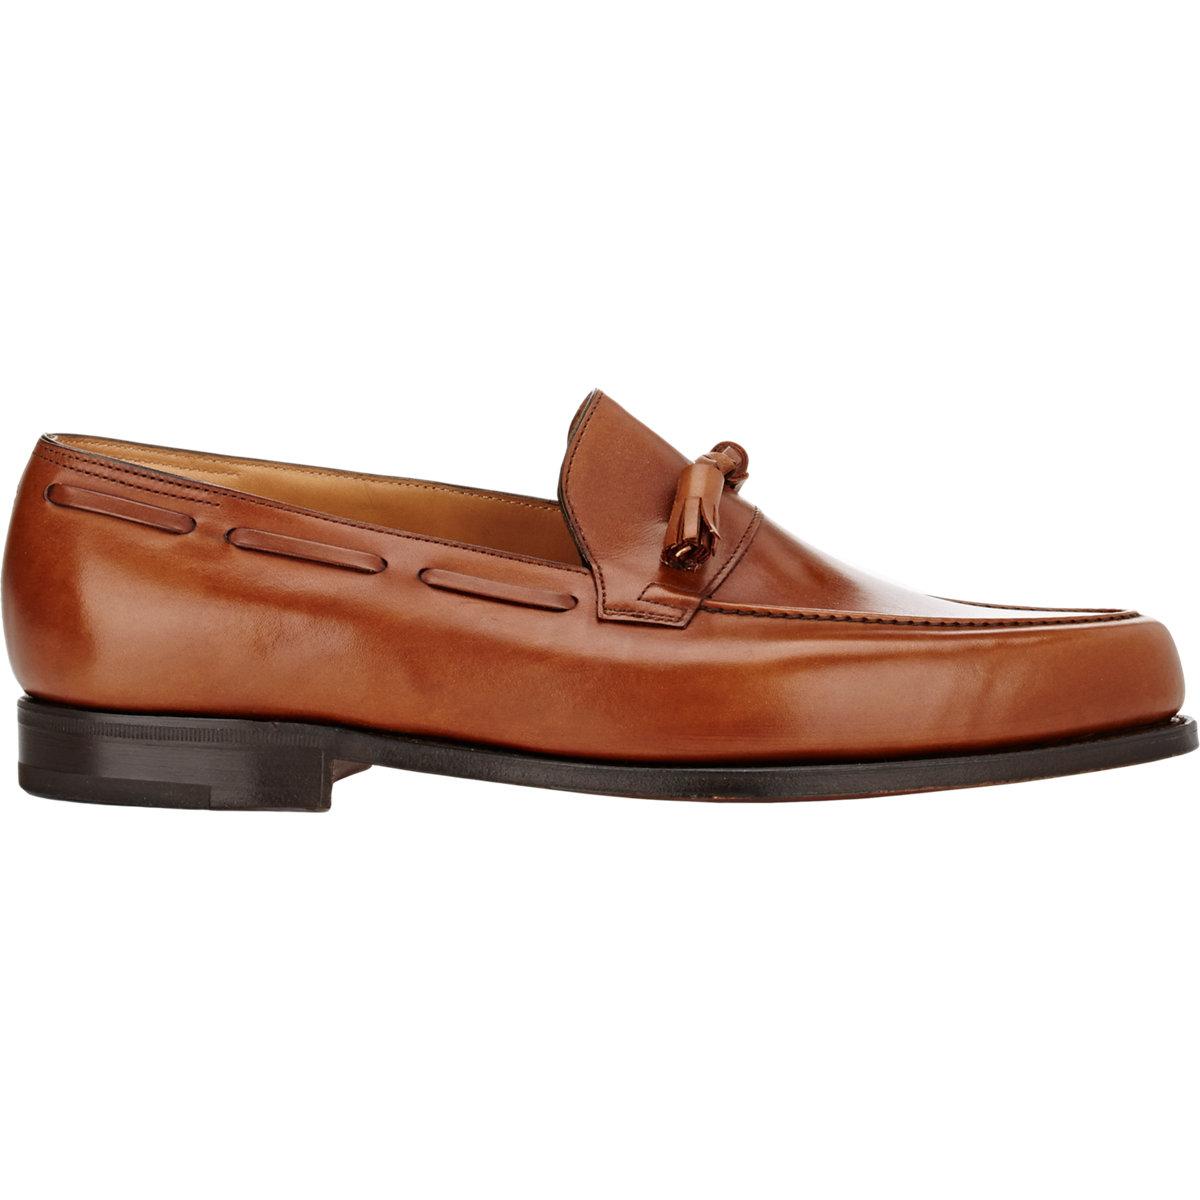 50c23d5ea51 Lyst - John Lobb Men s Alton Tassel Loafers in Brown for Men